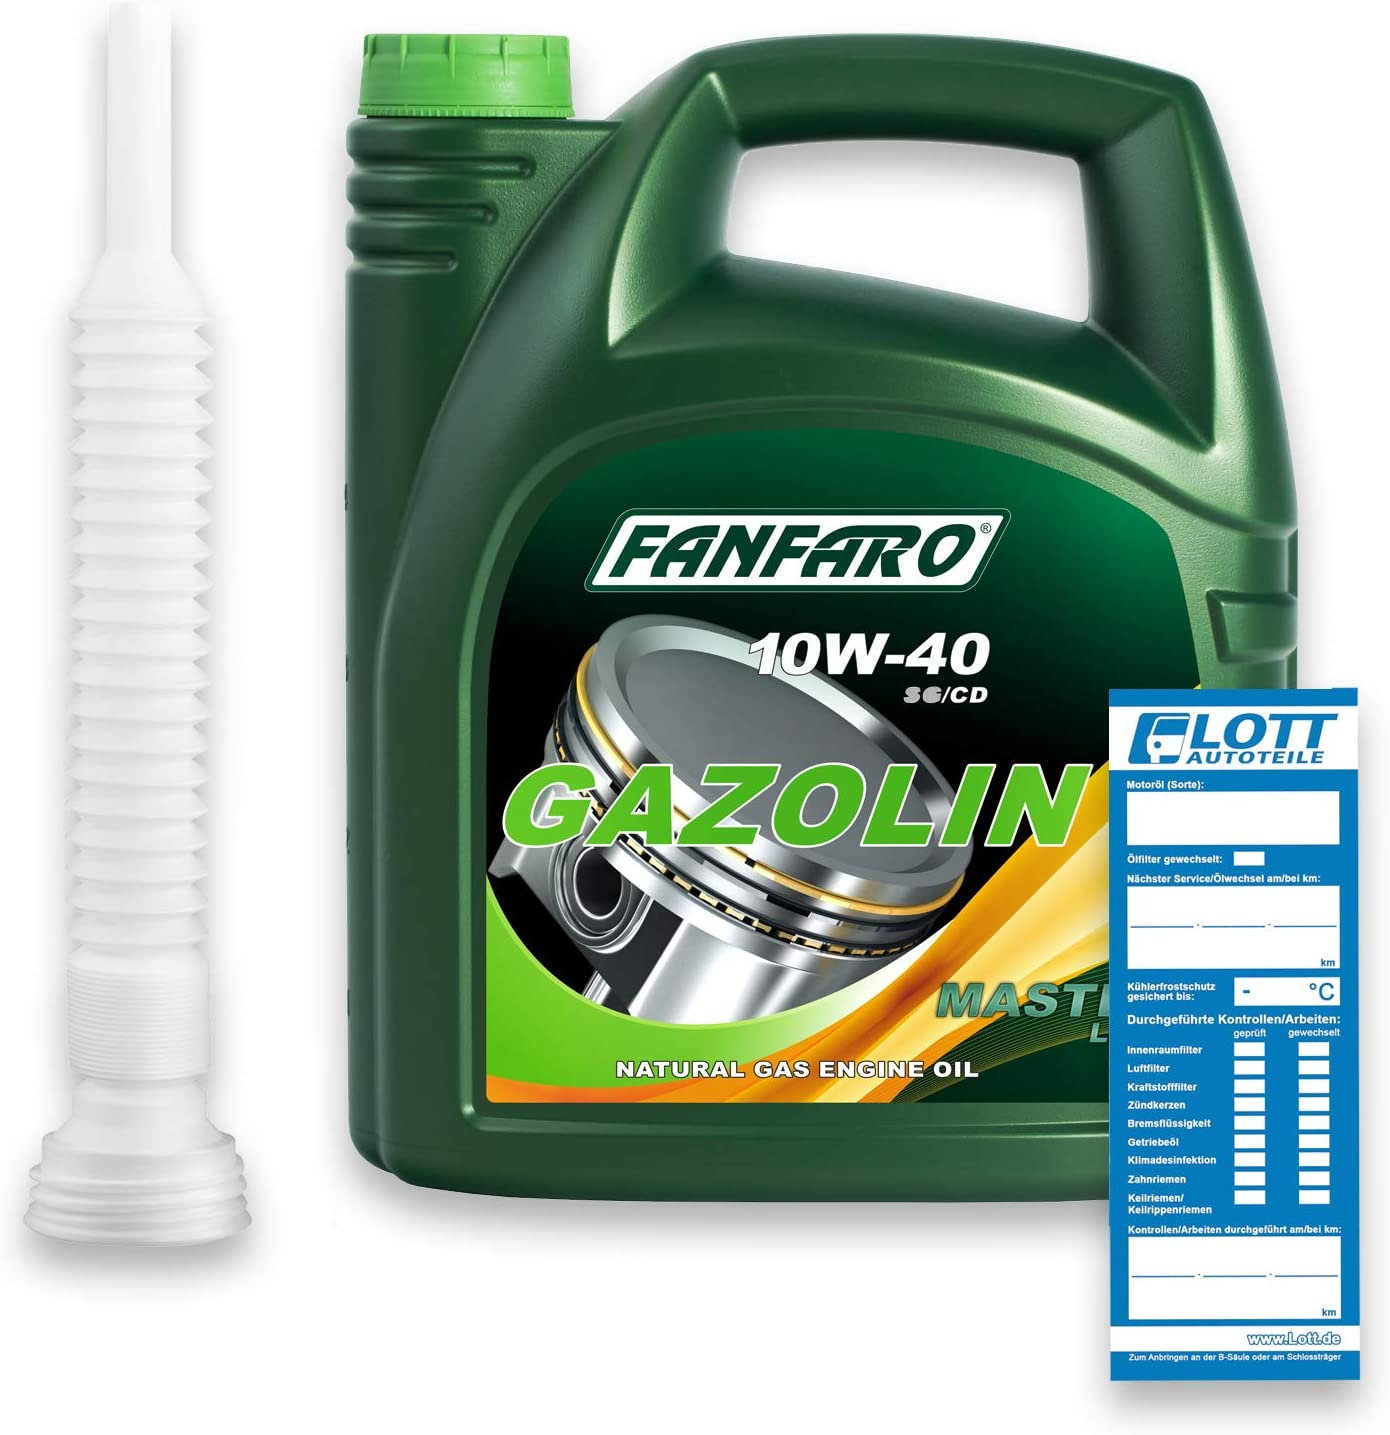 Fanfaro 10w40 10w 40 Gasoline Motoröl Api Sg Cd 5 Liter Öl Ablassschlauch Auto